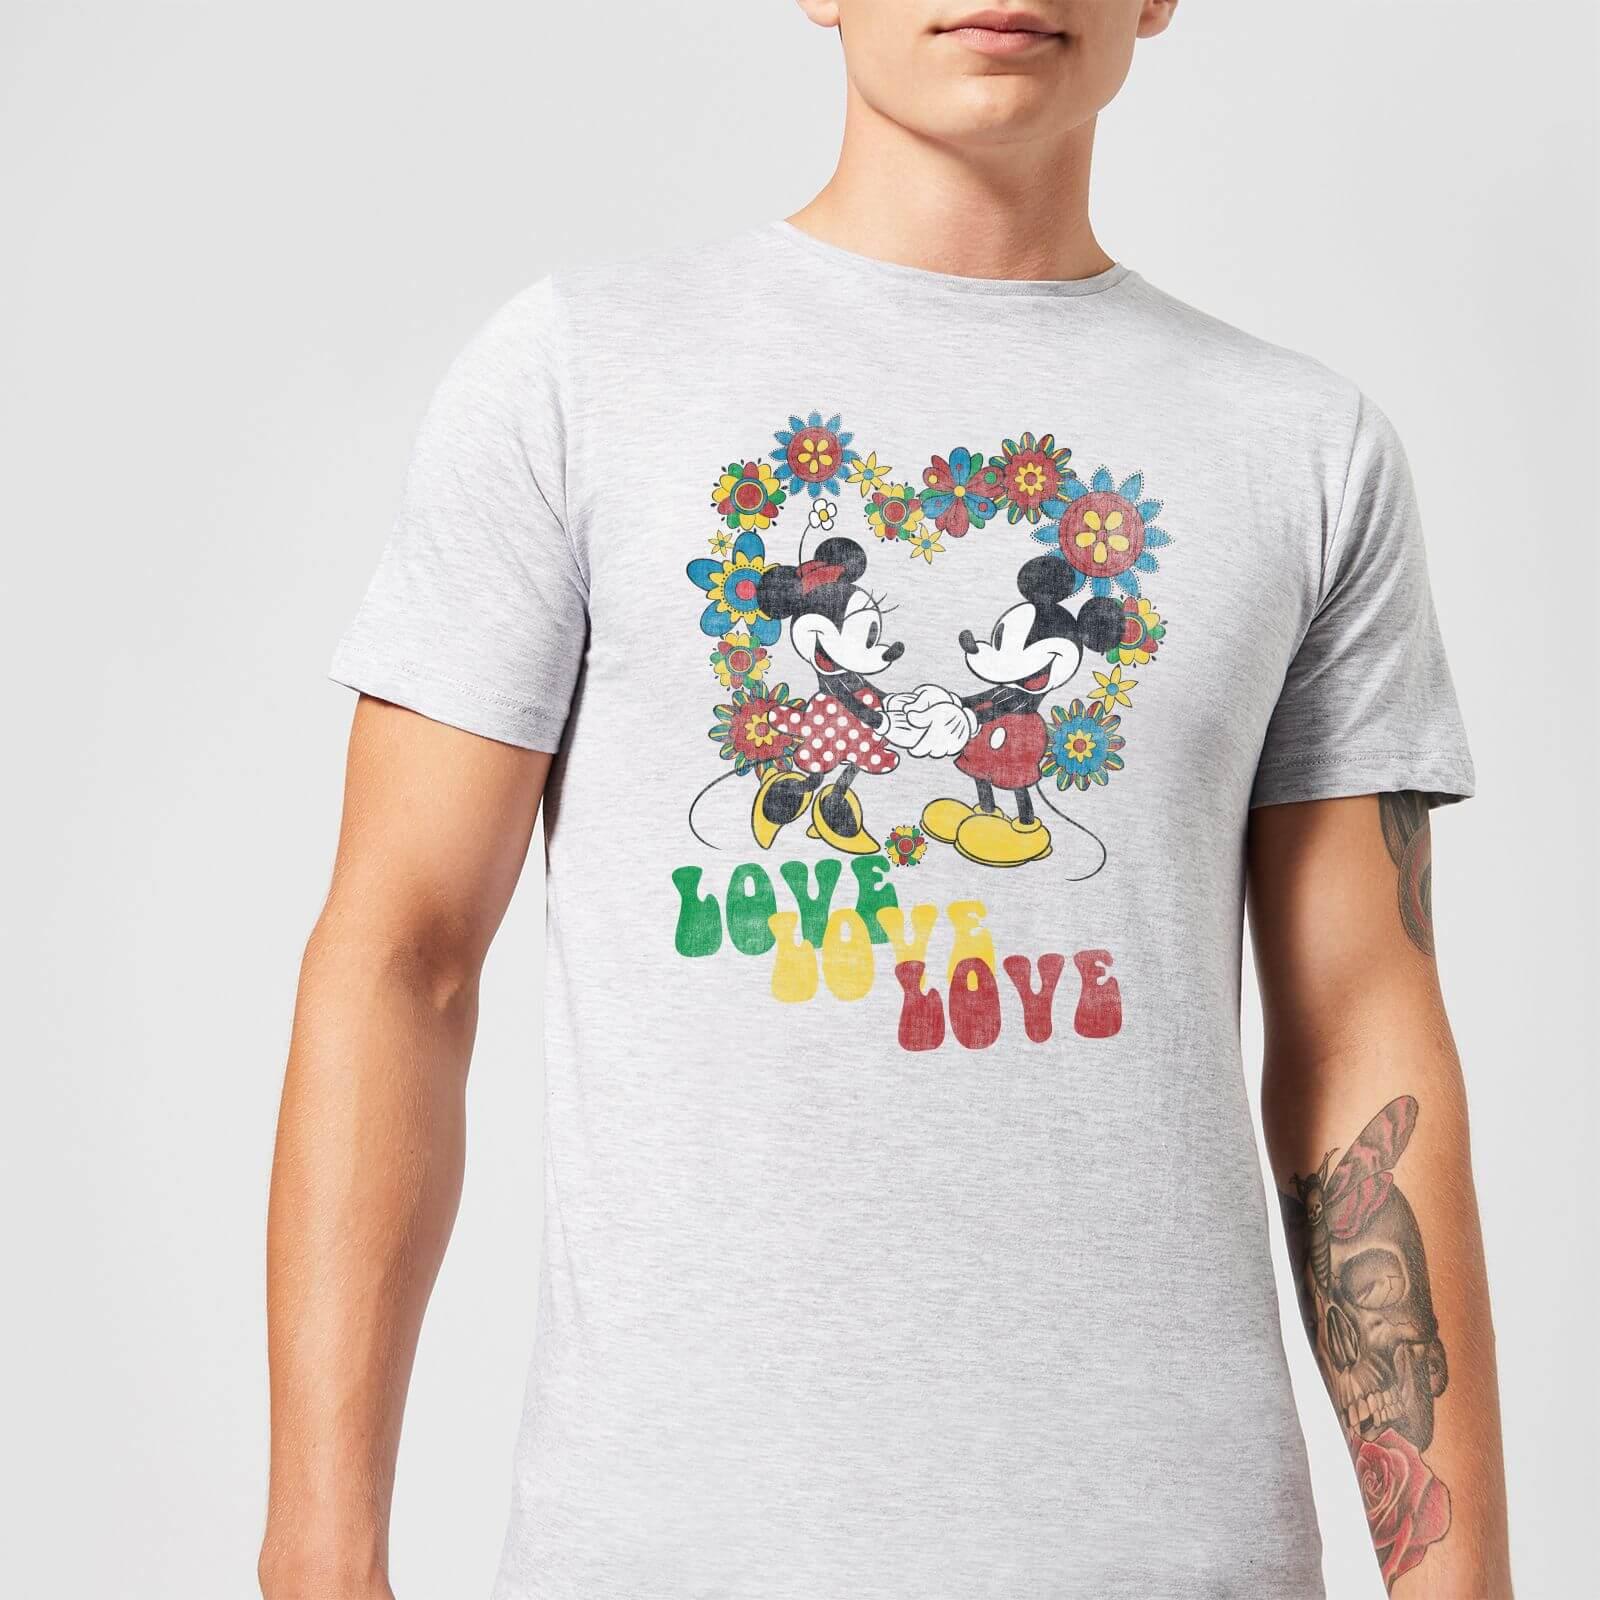 Disney Mickey Mouse Hippie Love T-Shirt - Grey - 4XL - Grey